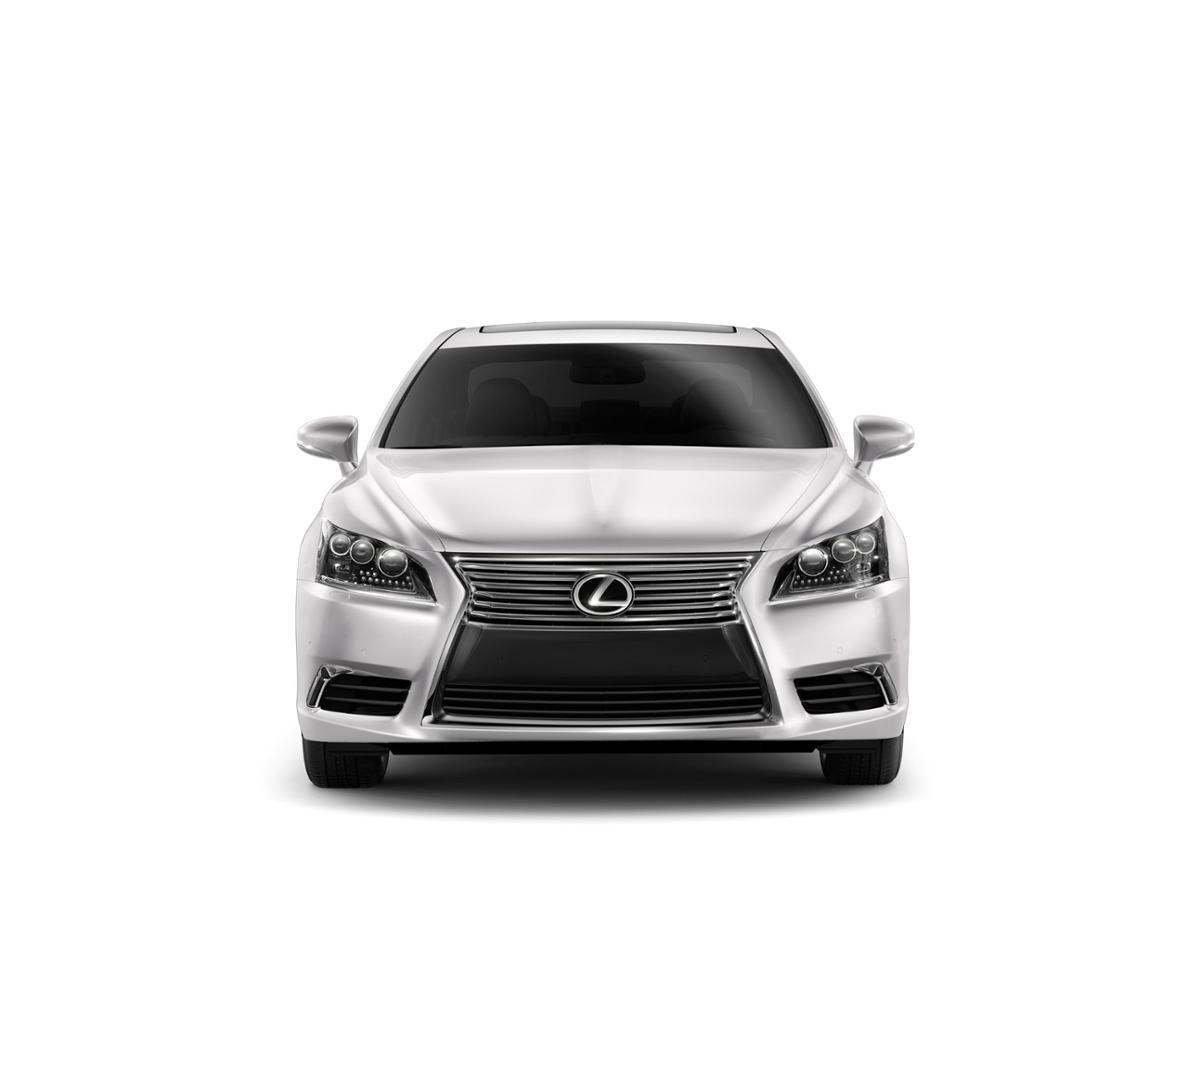 2013 Lexus Ls460 For Sale: Escondido Eminent White Pearl 2017 Lexus LS 460: New Car